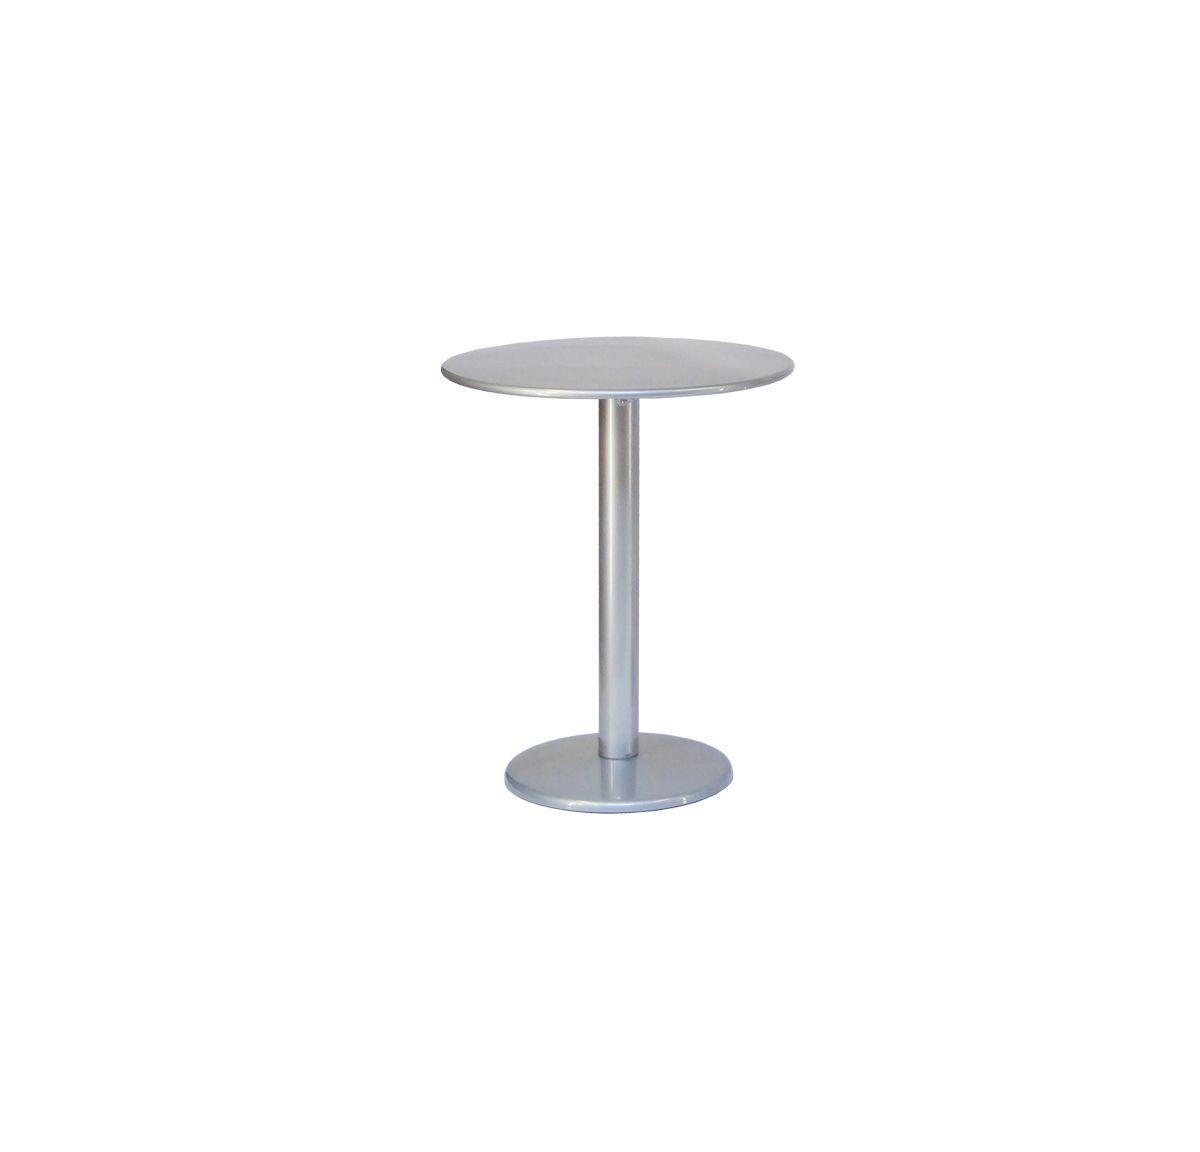 emuamericas, llc 900-20 table, outdoor